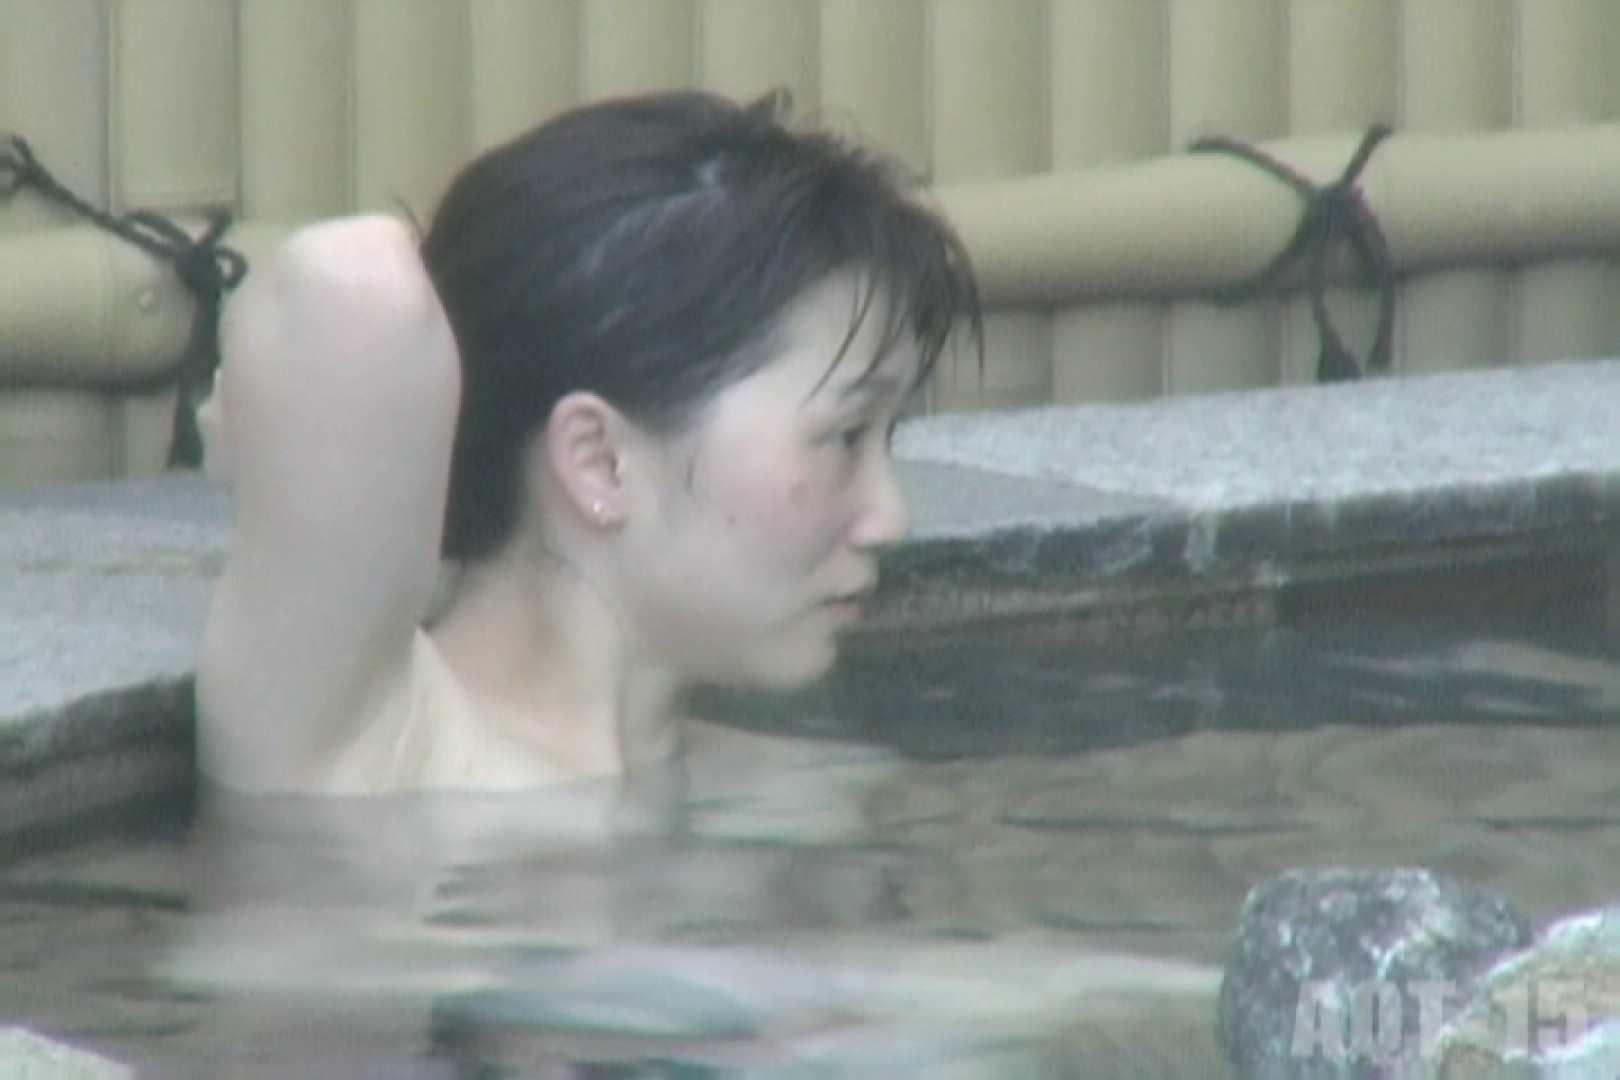 Aquaな露天風呂Vol.831 露天   HなOL  99pic 78